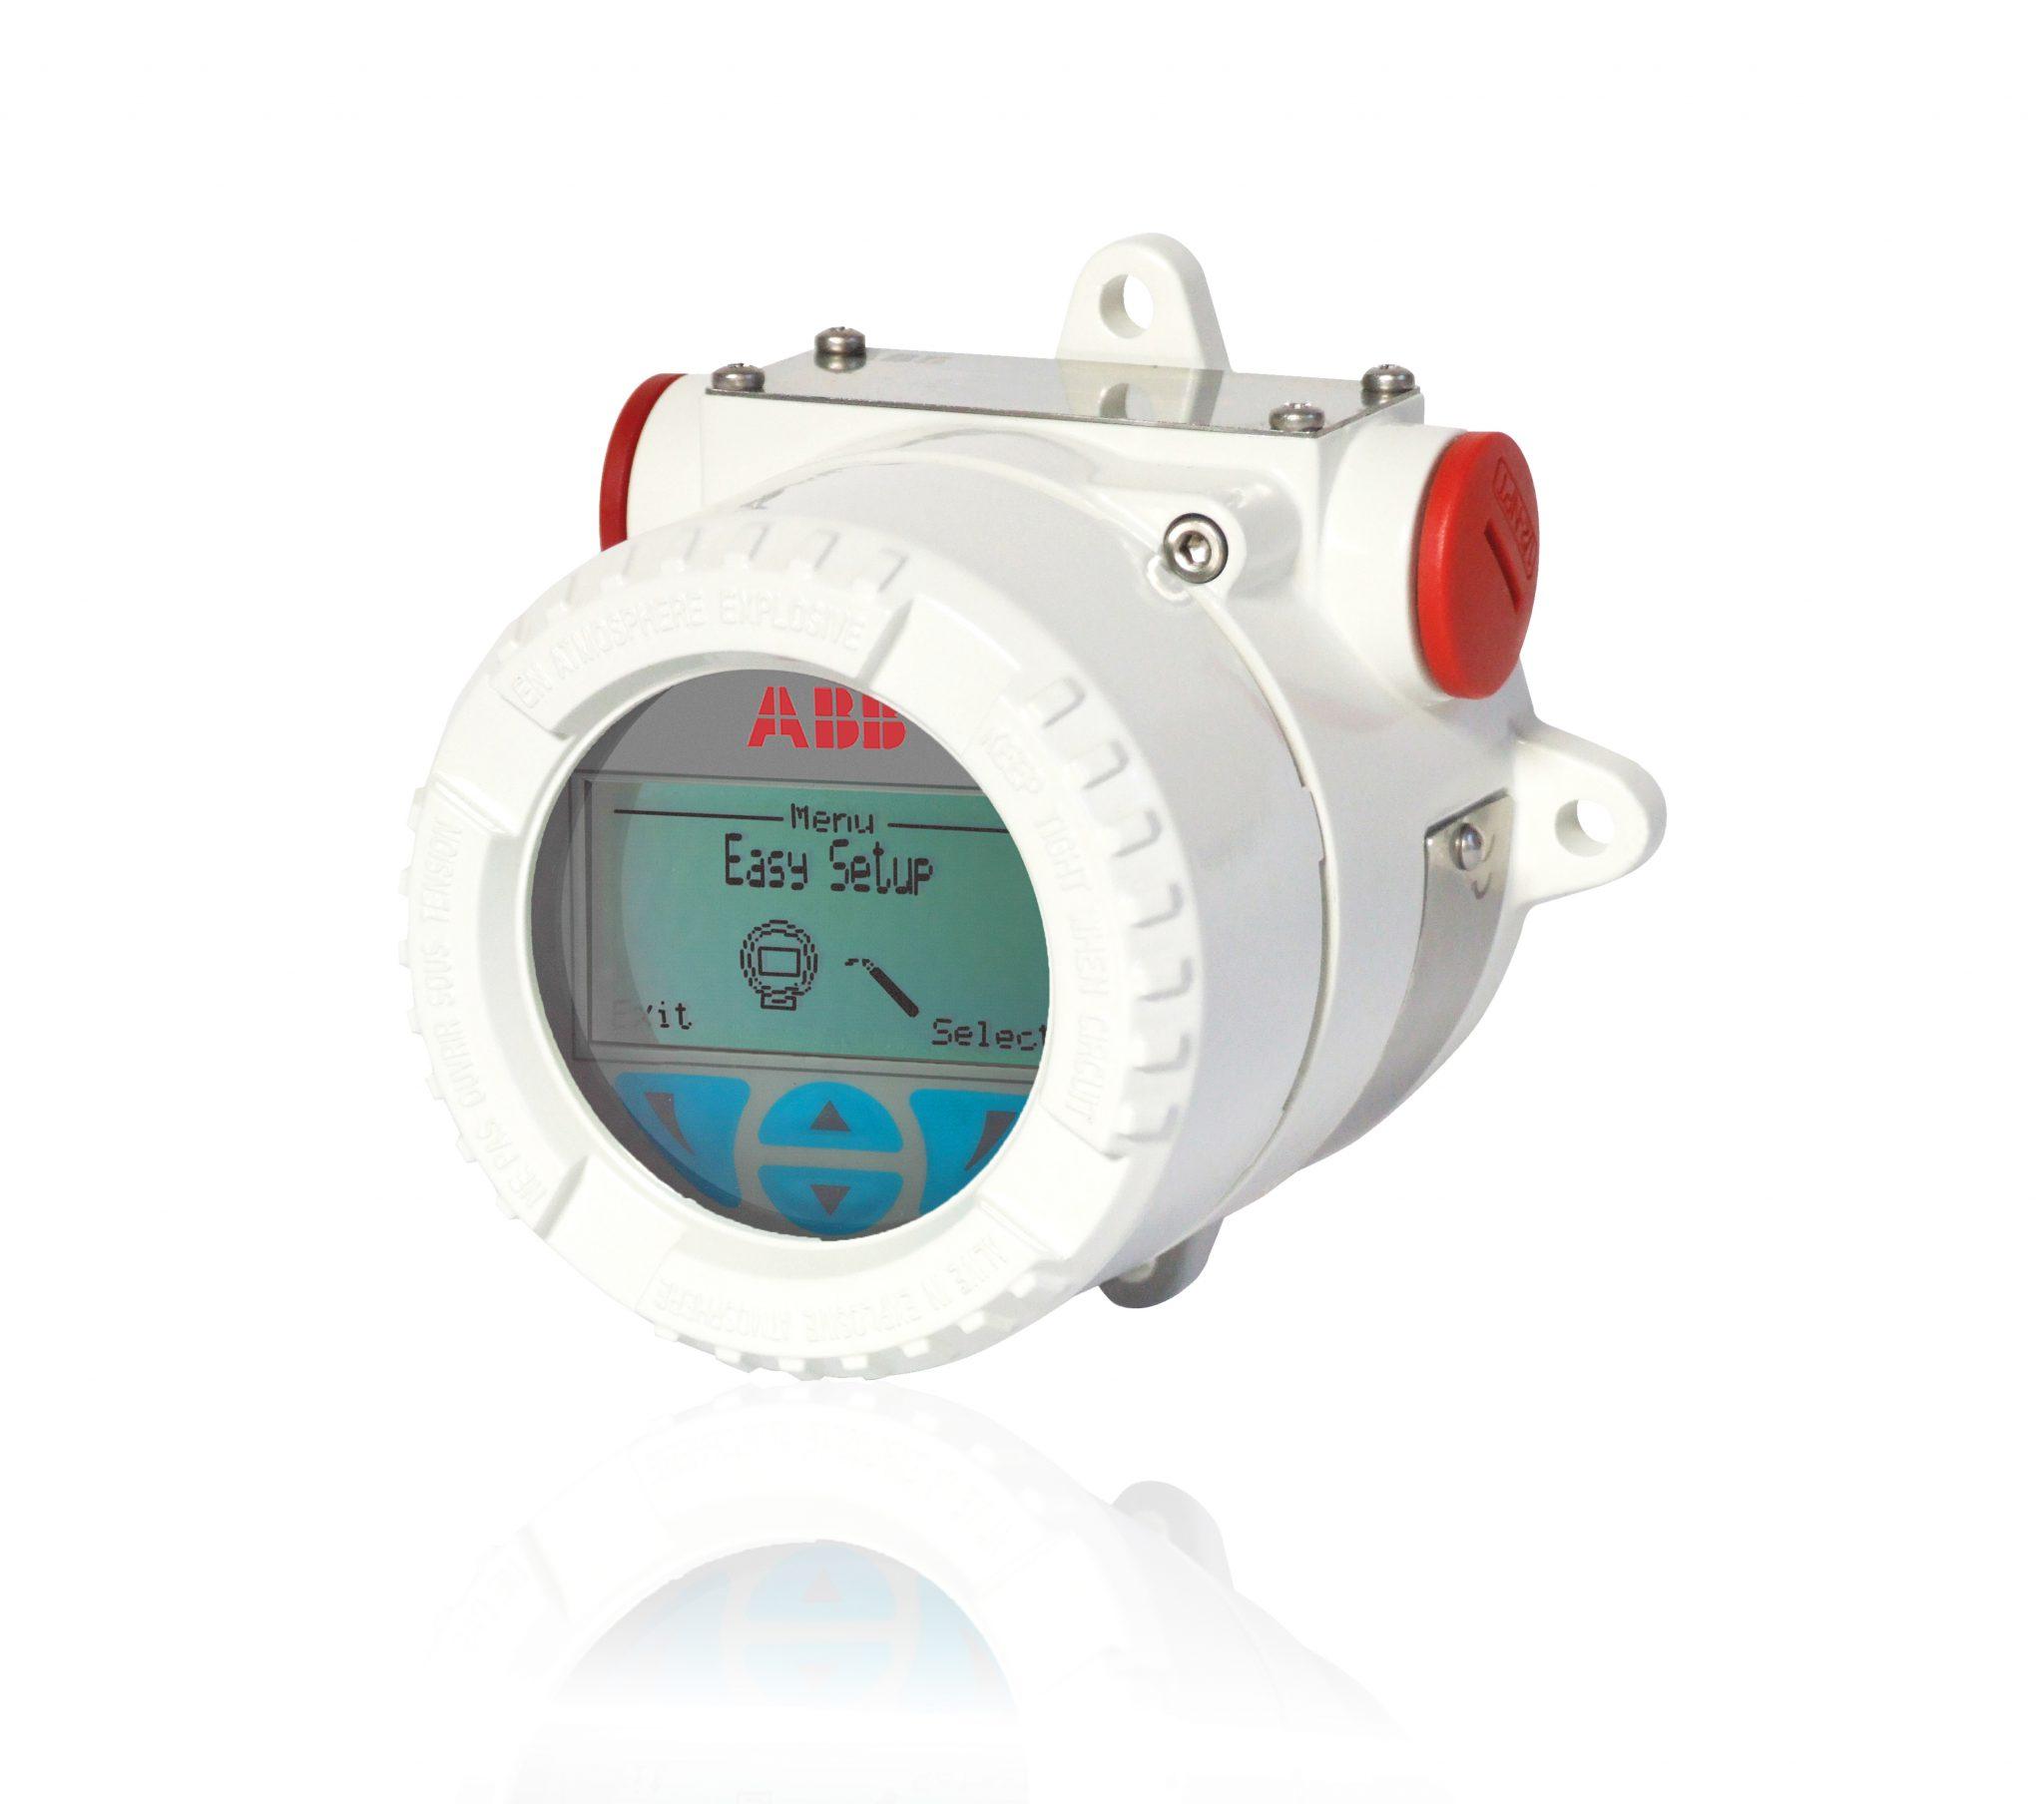 Original Image: ABB JDF200 Remote Indicator